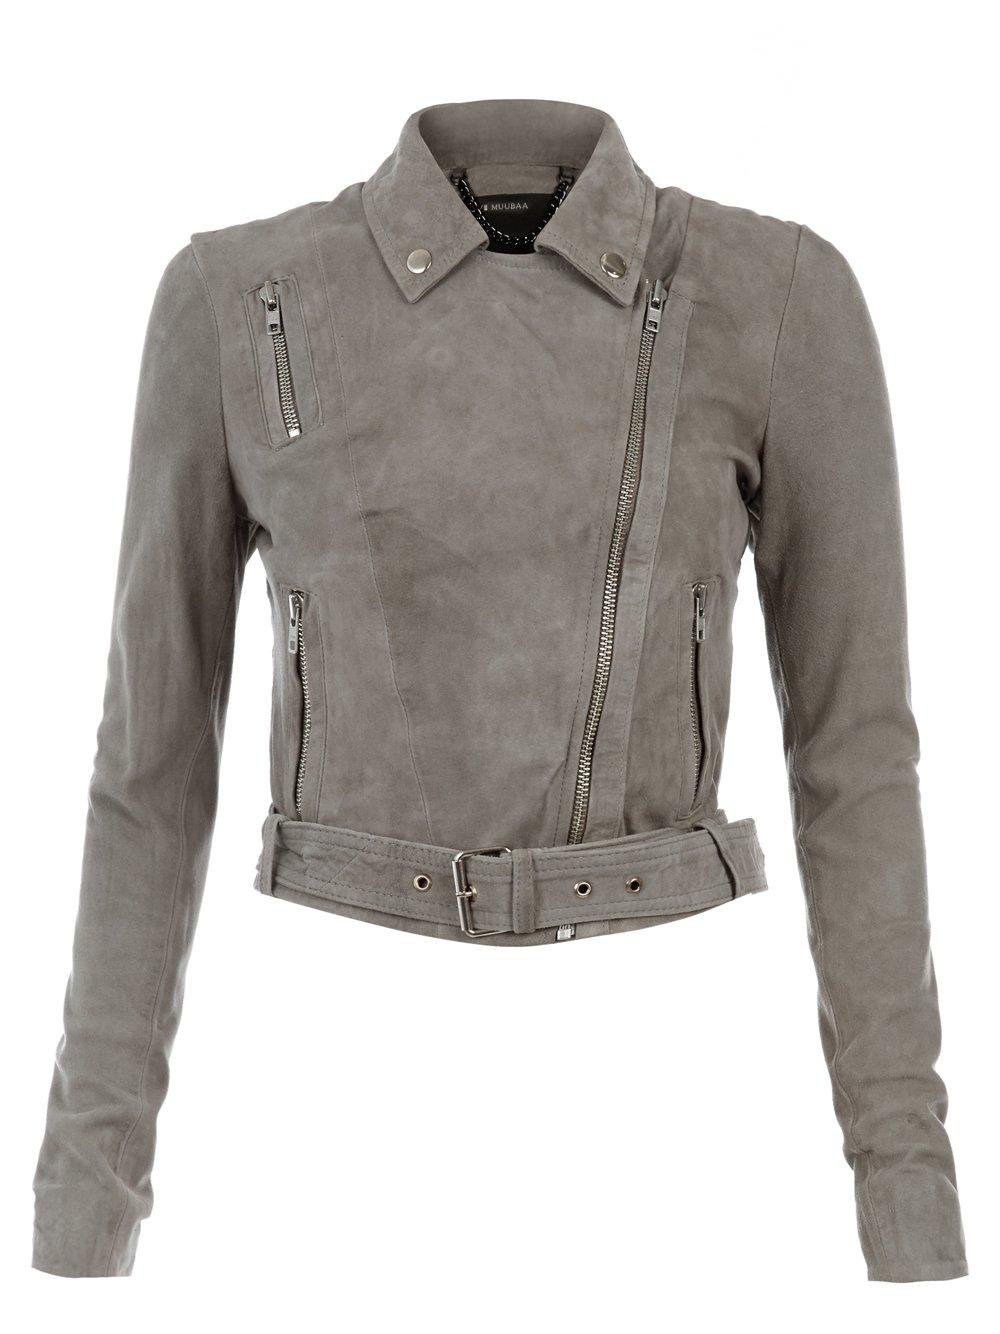 Orinoco Grey Cropped Suede Jacket